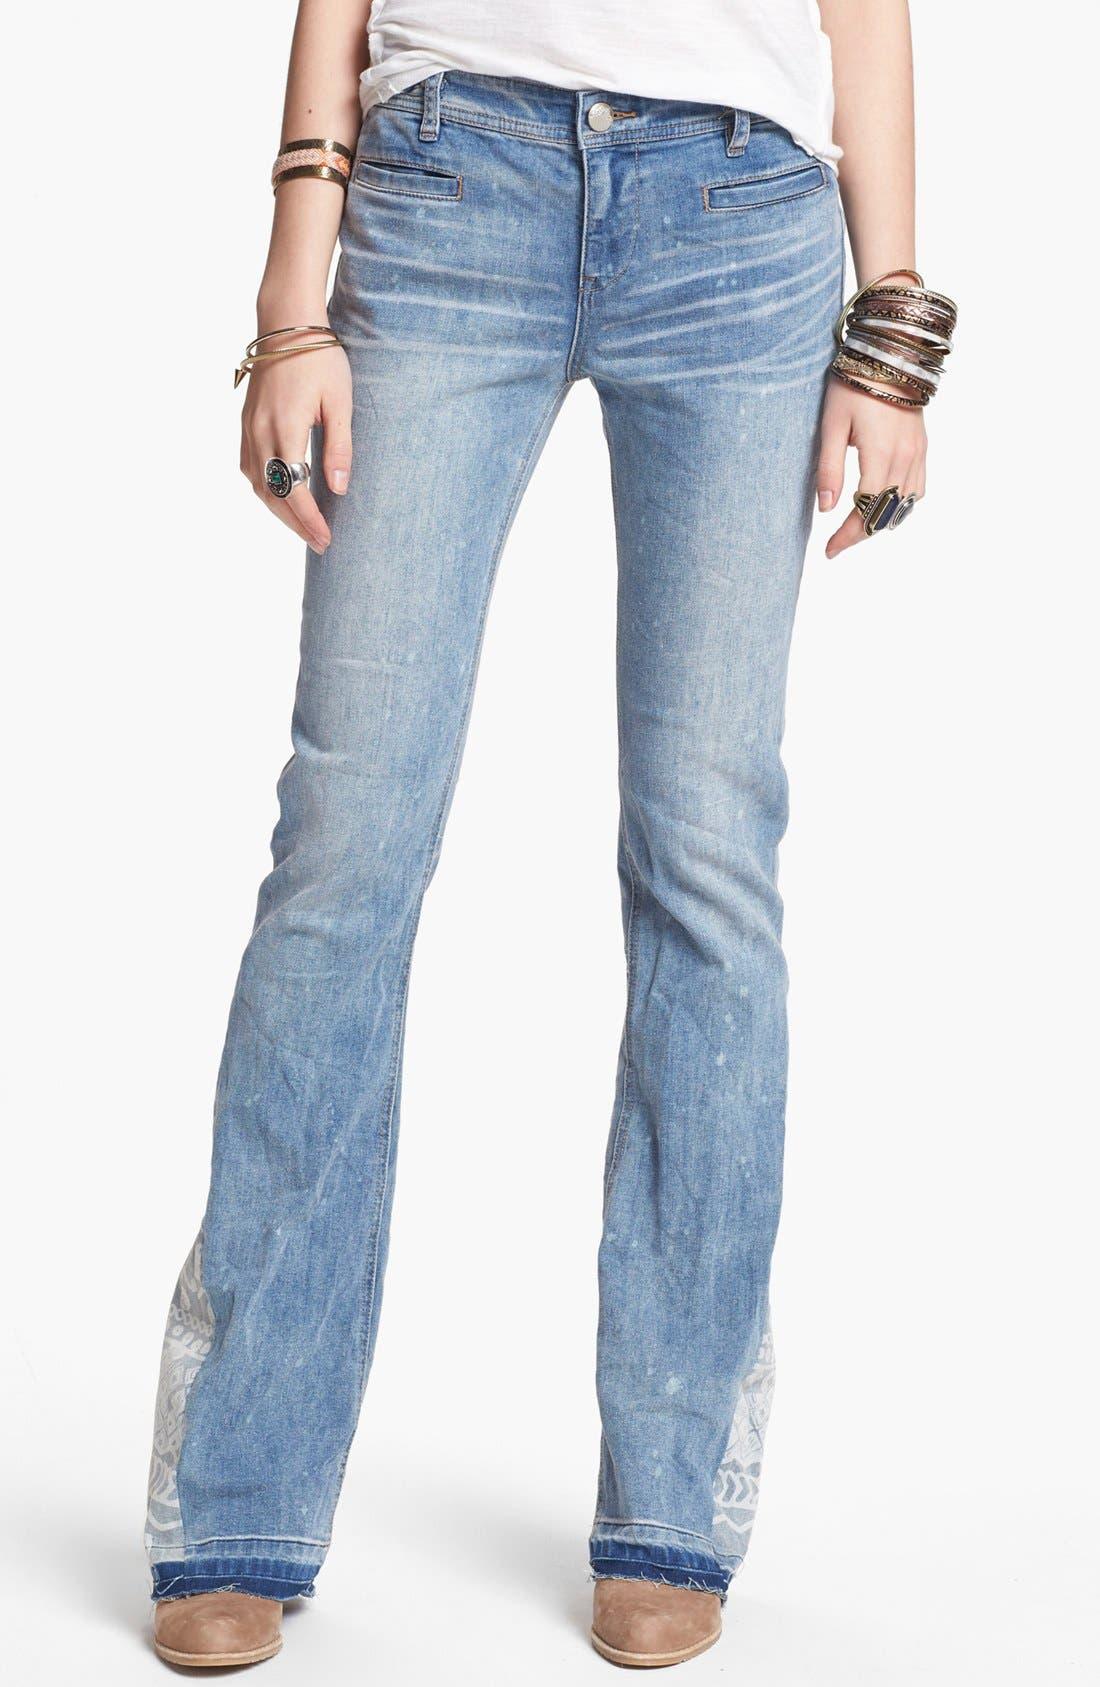 Main Image - Free People 'Mermaid' Flare Leg Jeans (Palms Wash)